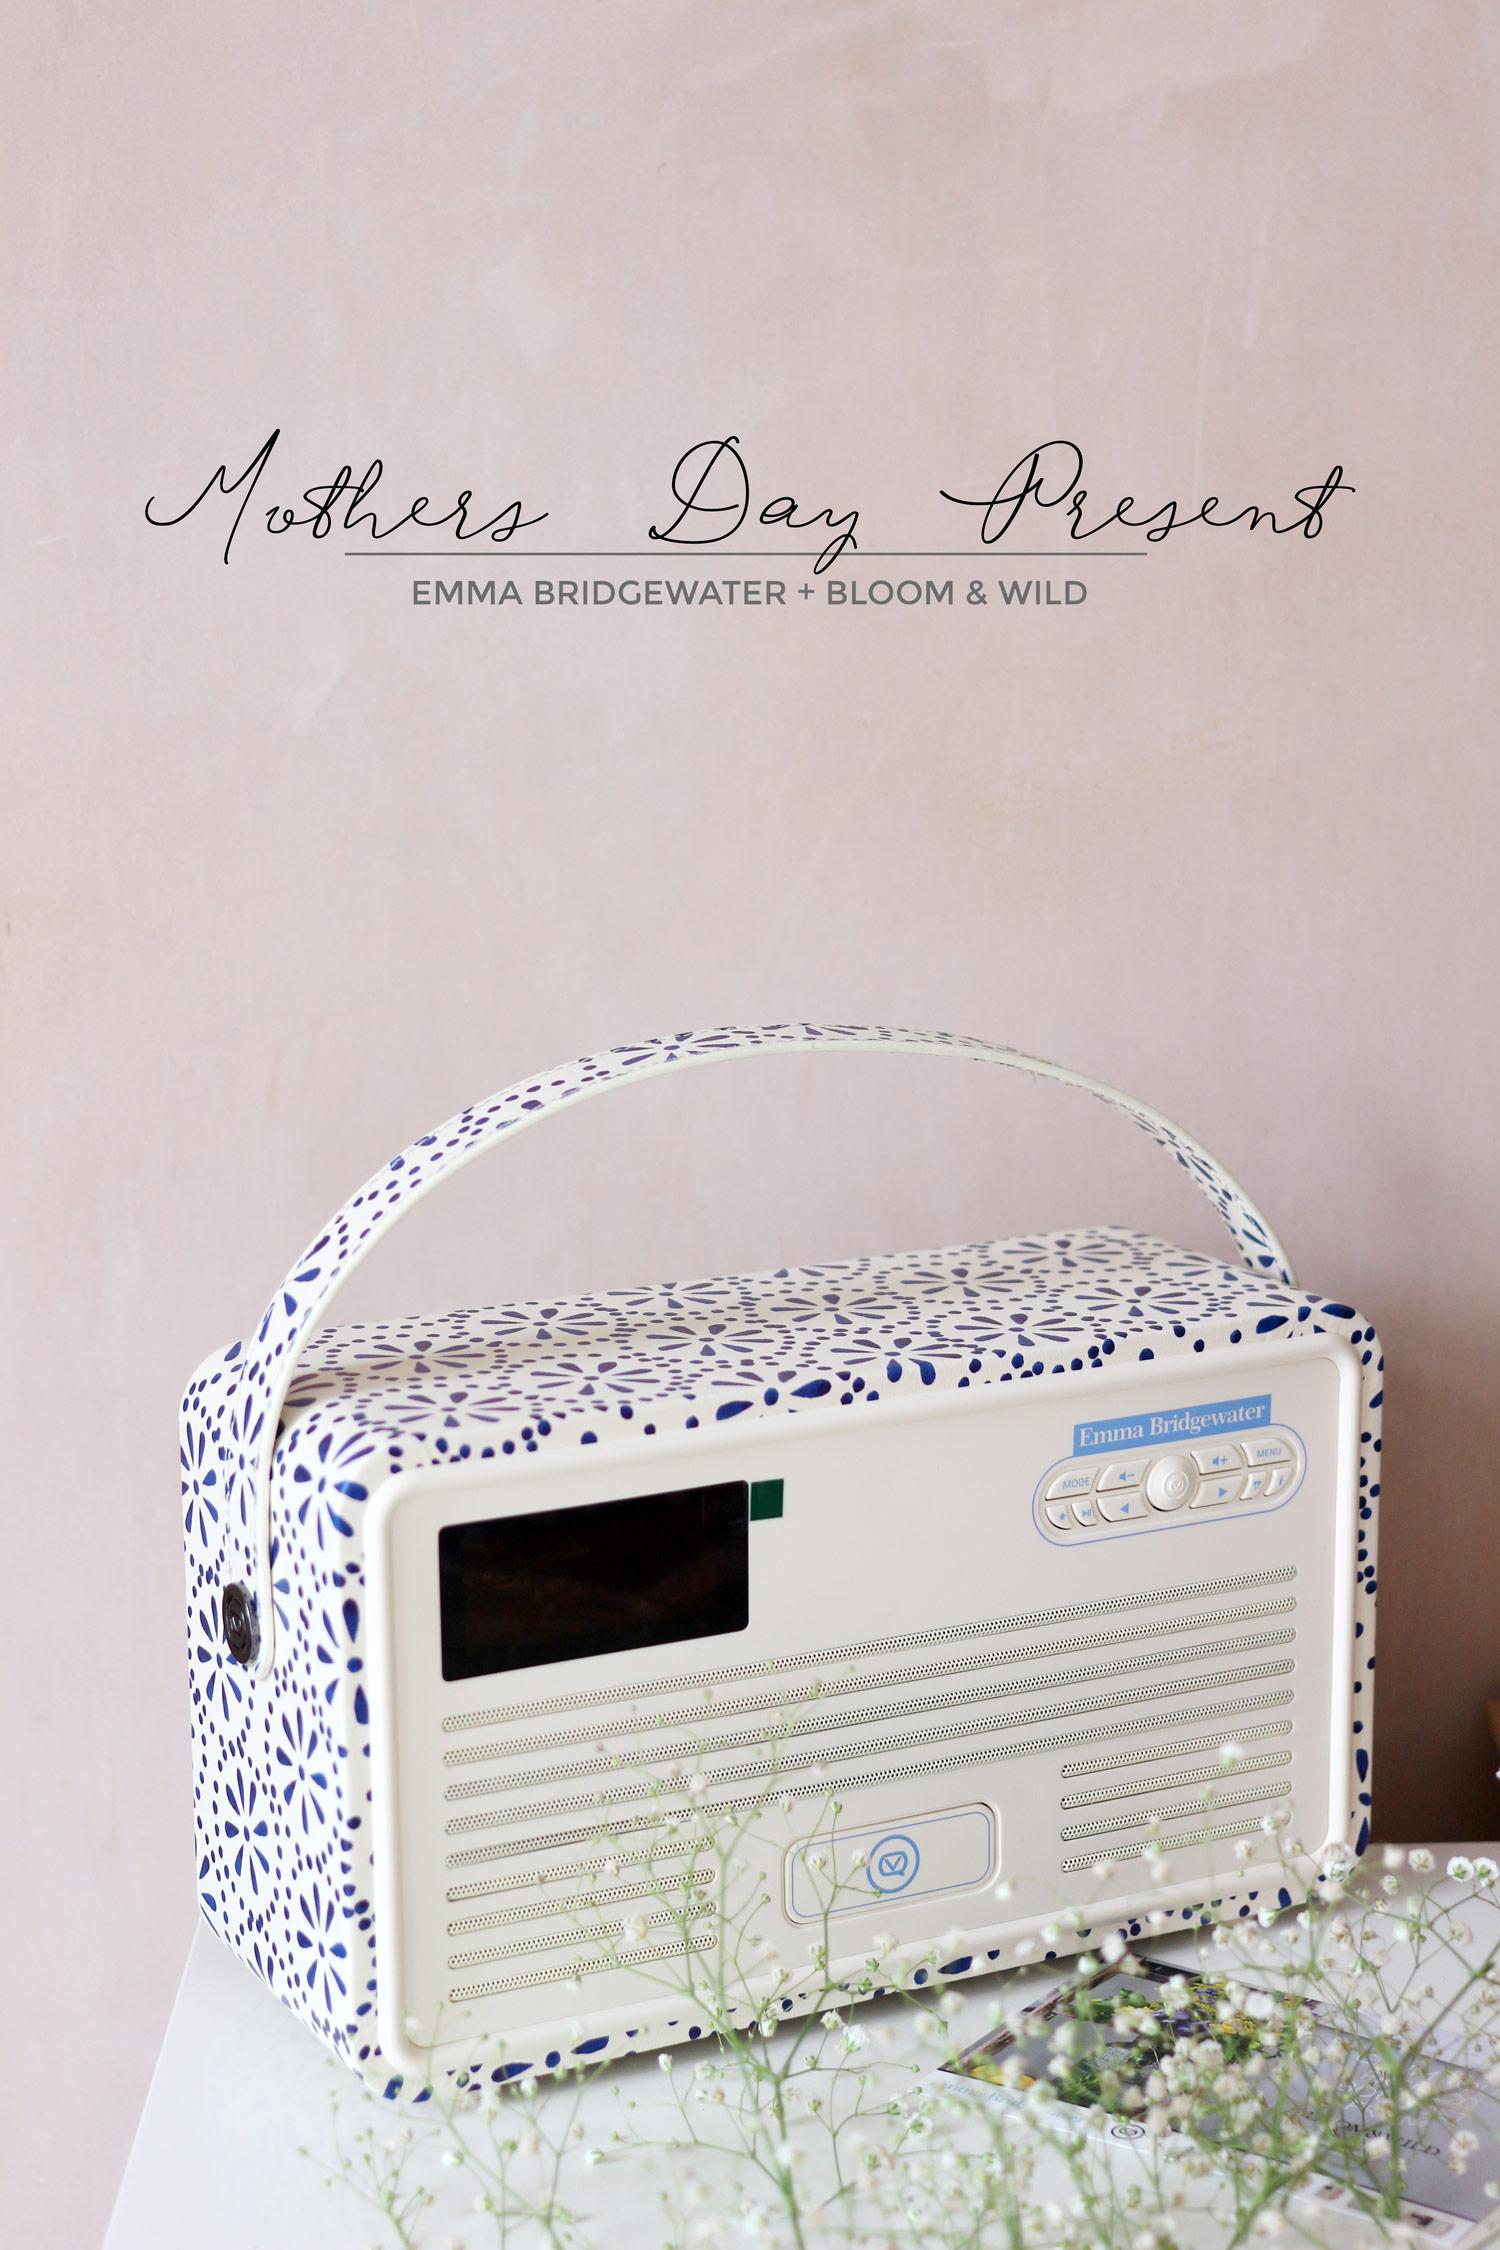 mothers-day-present-bloom-and-wild-emma-bridgewater-digital-radio-offer